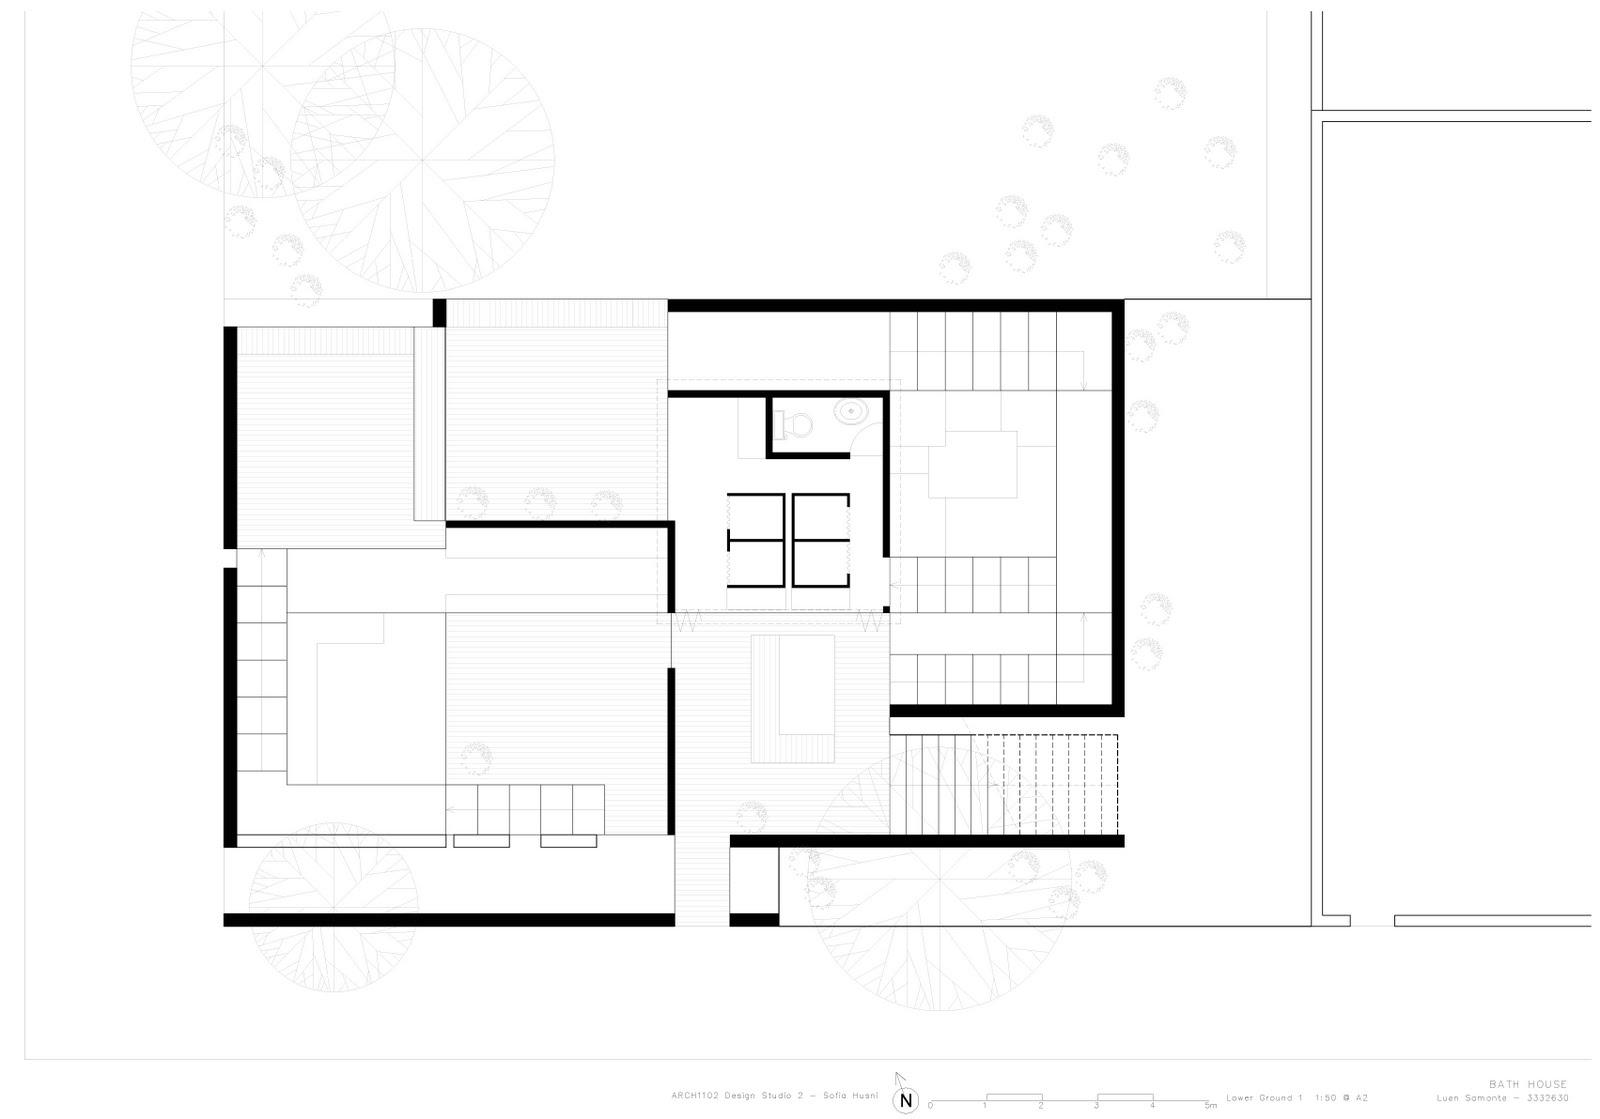 Bath house project